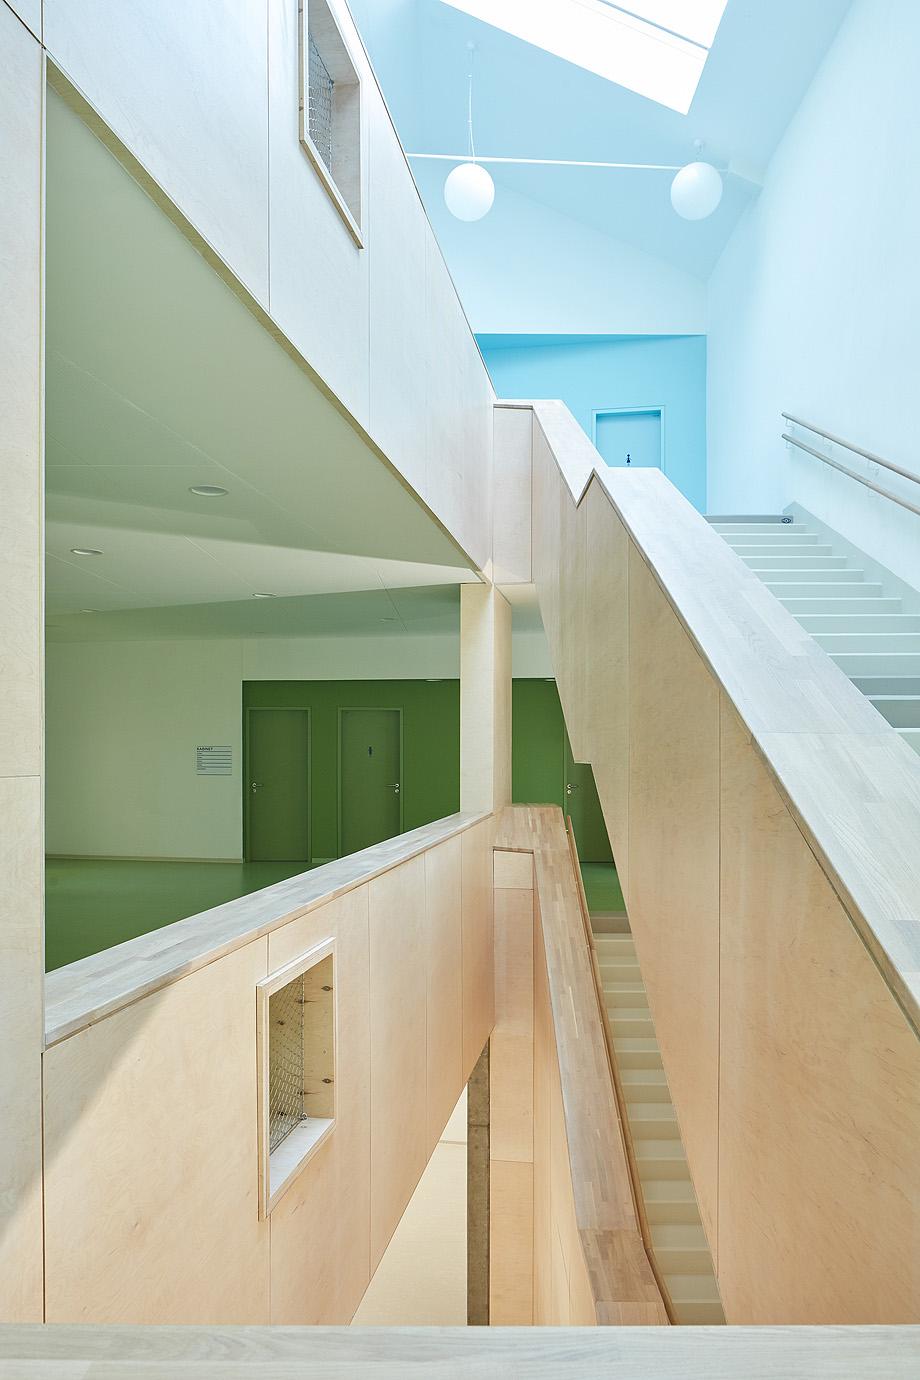 escuela de primaria de soa architekti - foto boysplaynice (18)